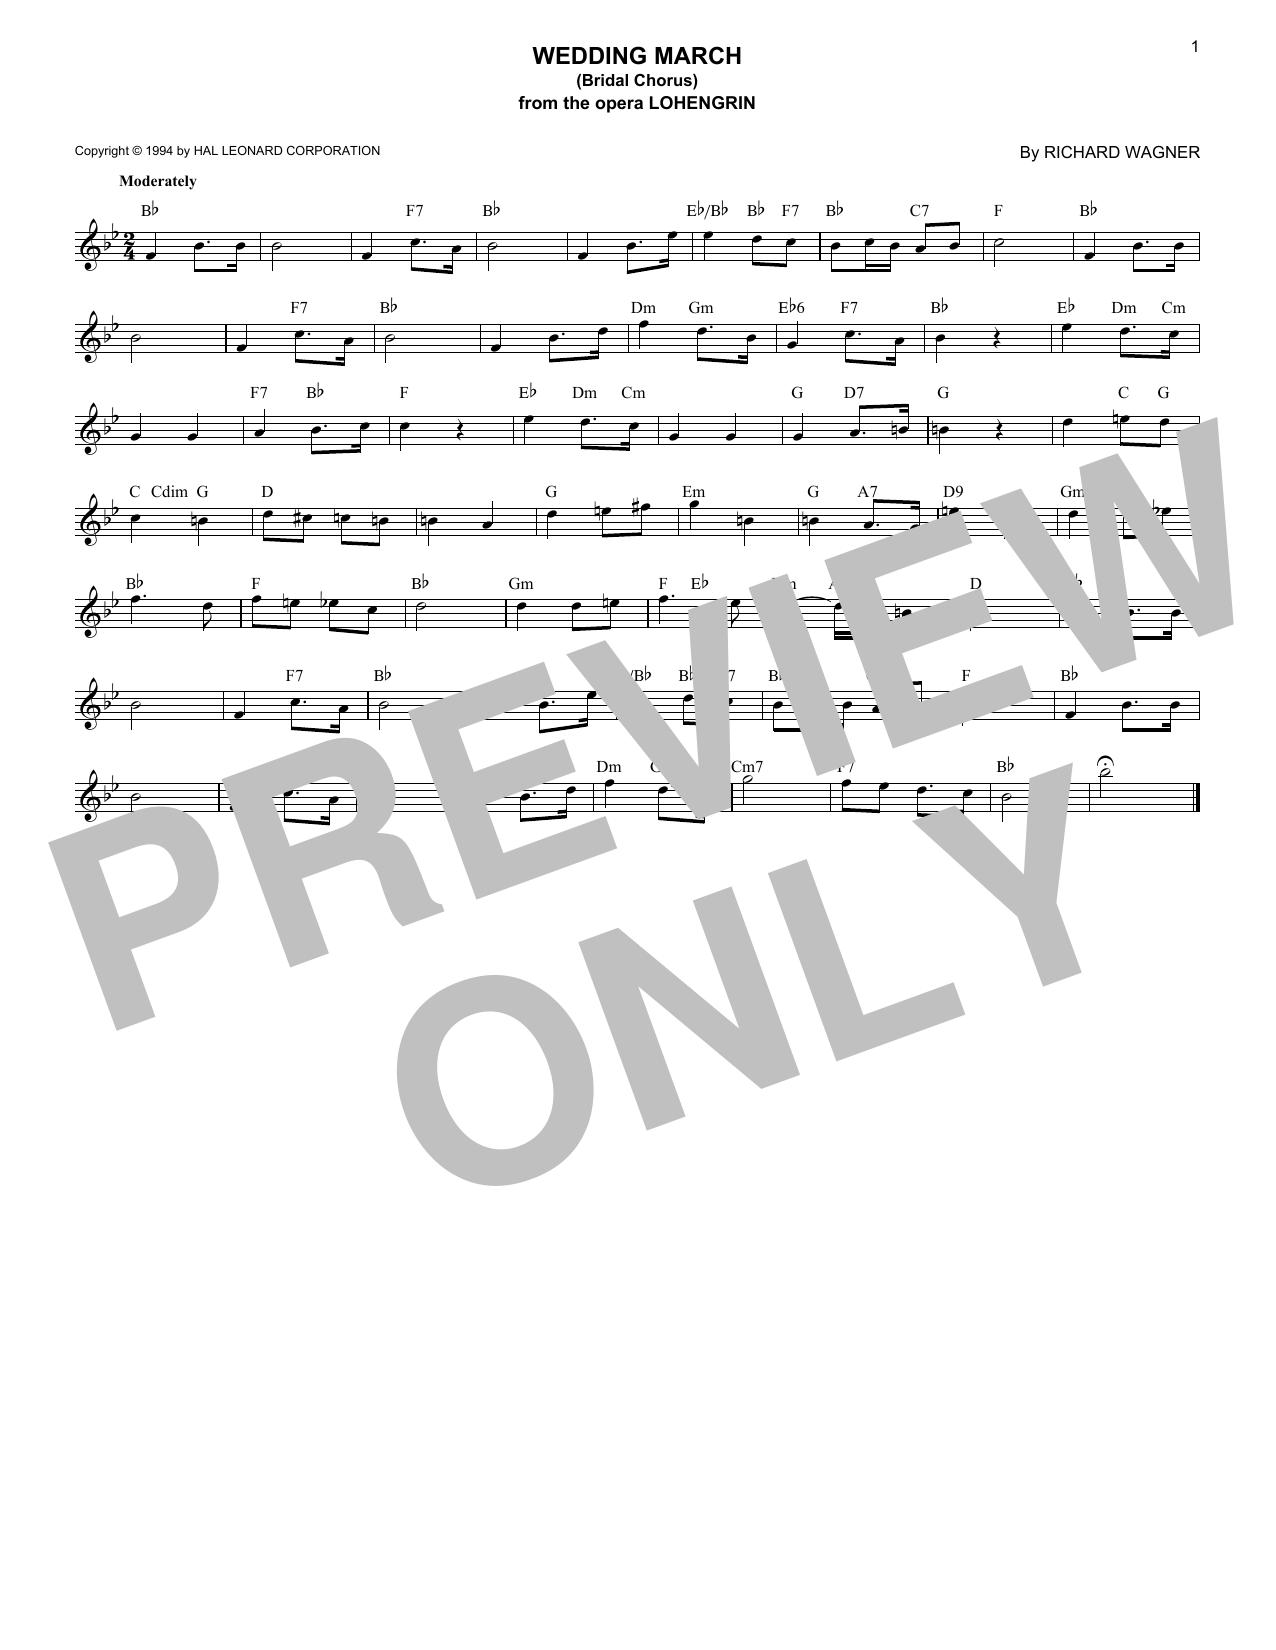 Richard Wagner Wedding March (Bridal Chorus) sheet music notes and chords